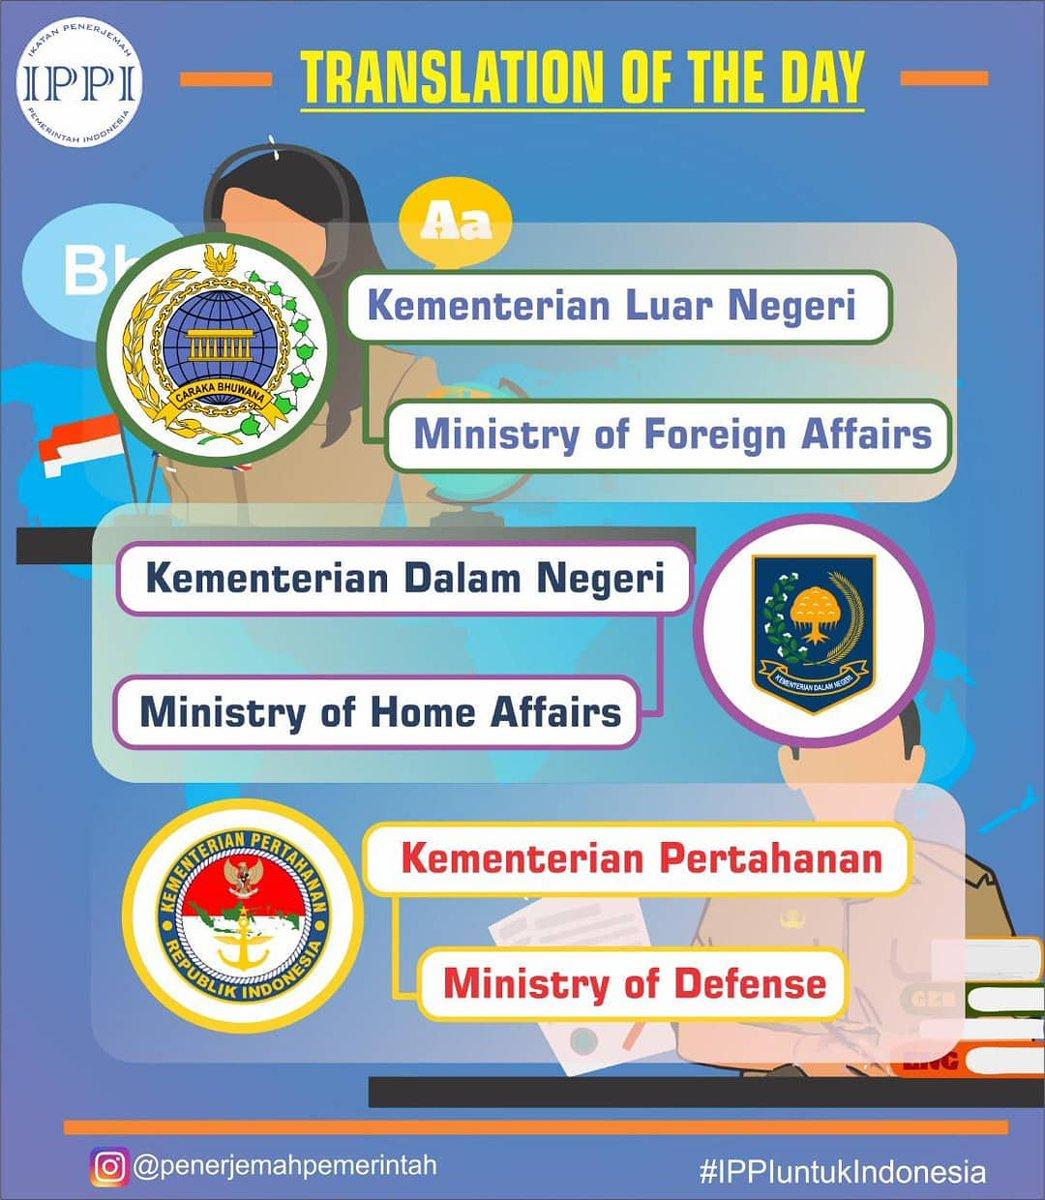 Ivan Lanin On Twitter Nama Kementerian Republik Indonesia Dalam Bahasa Inggris Dari Ippi Penerjemah Utas Thread Padanan